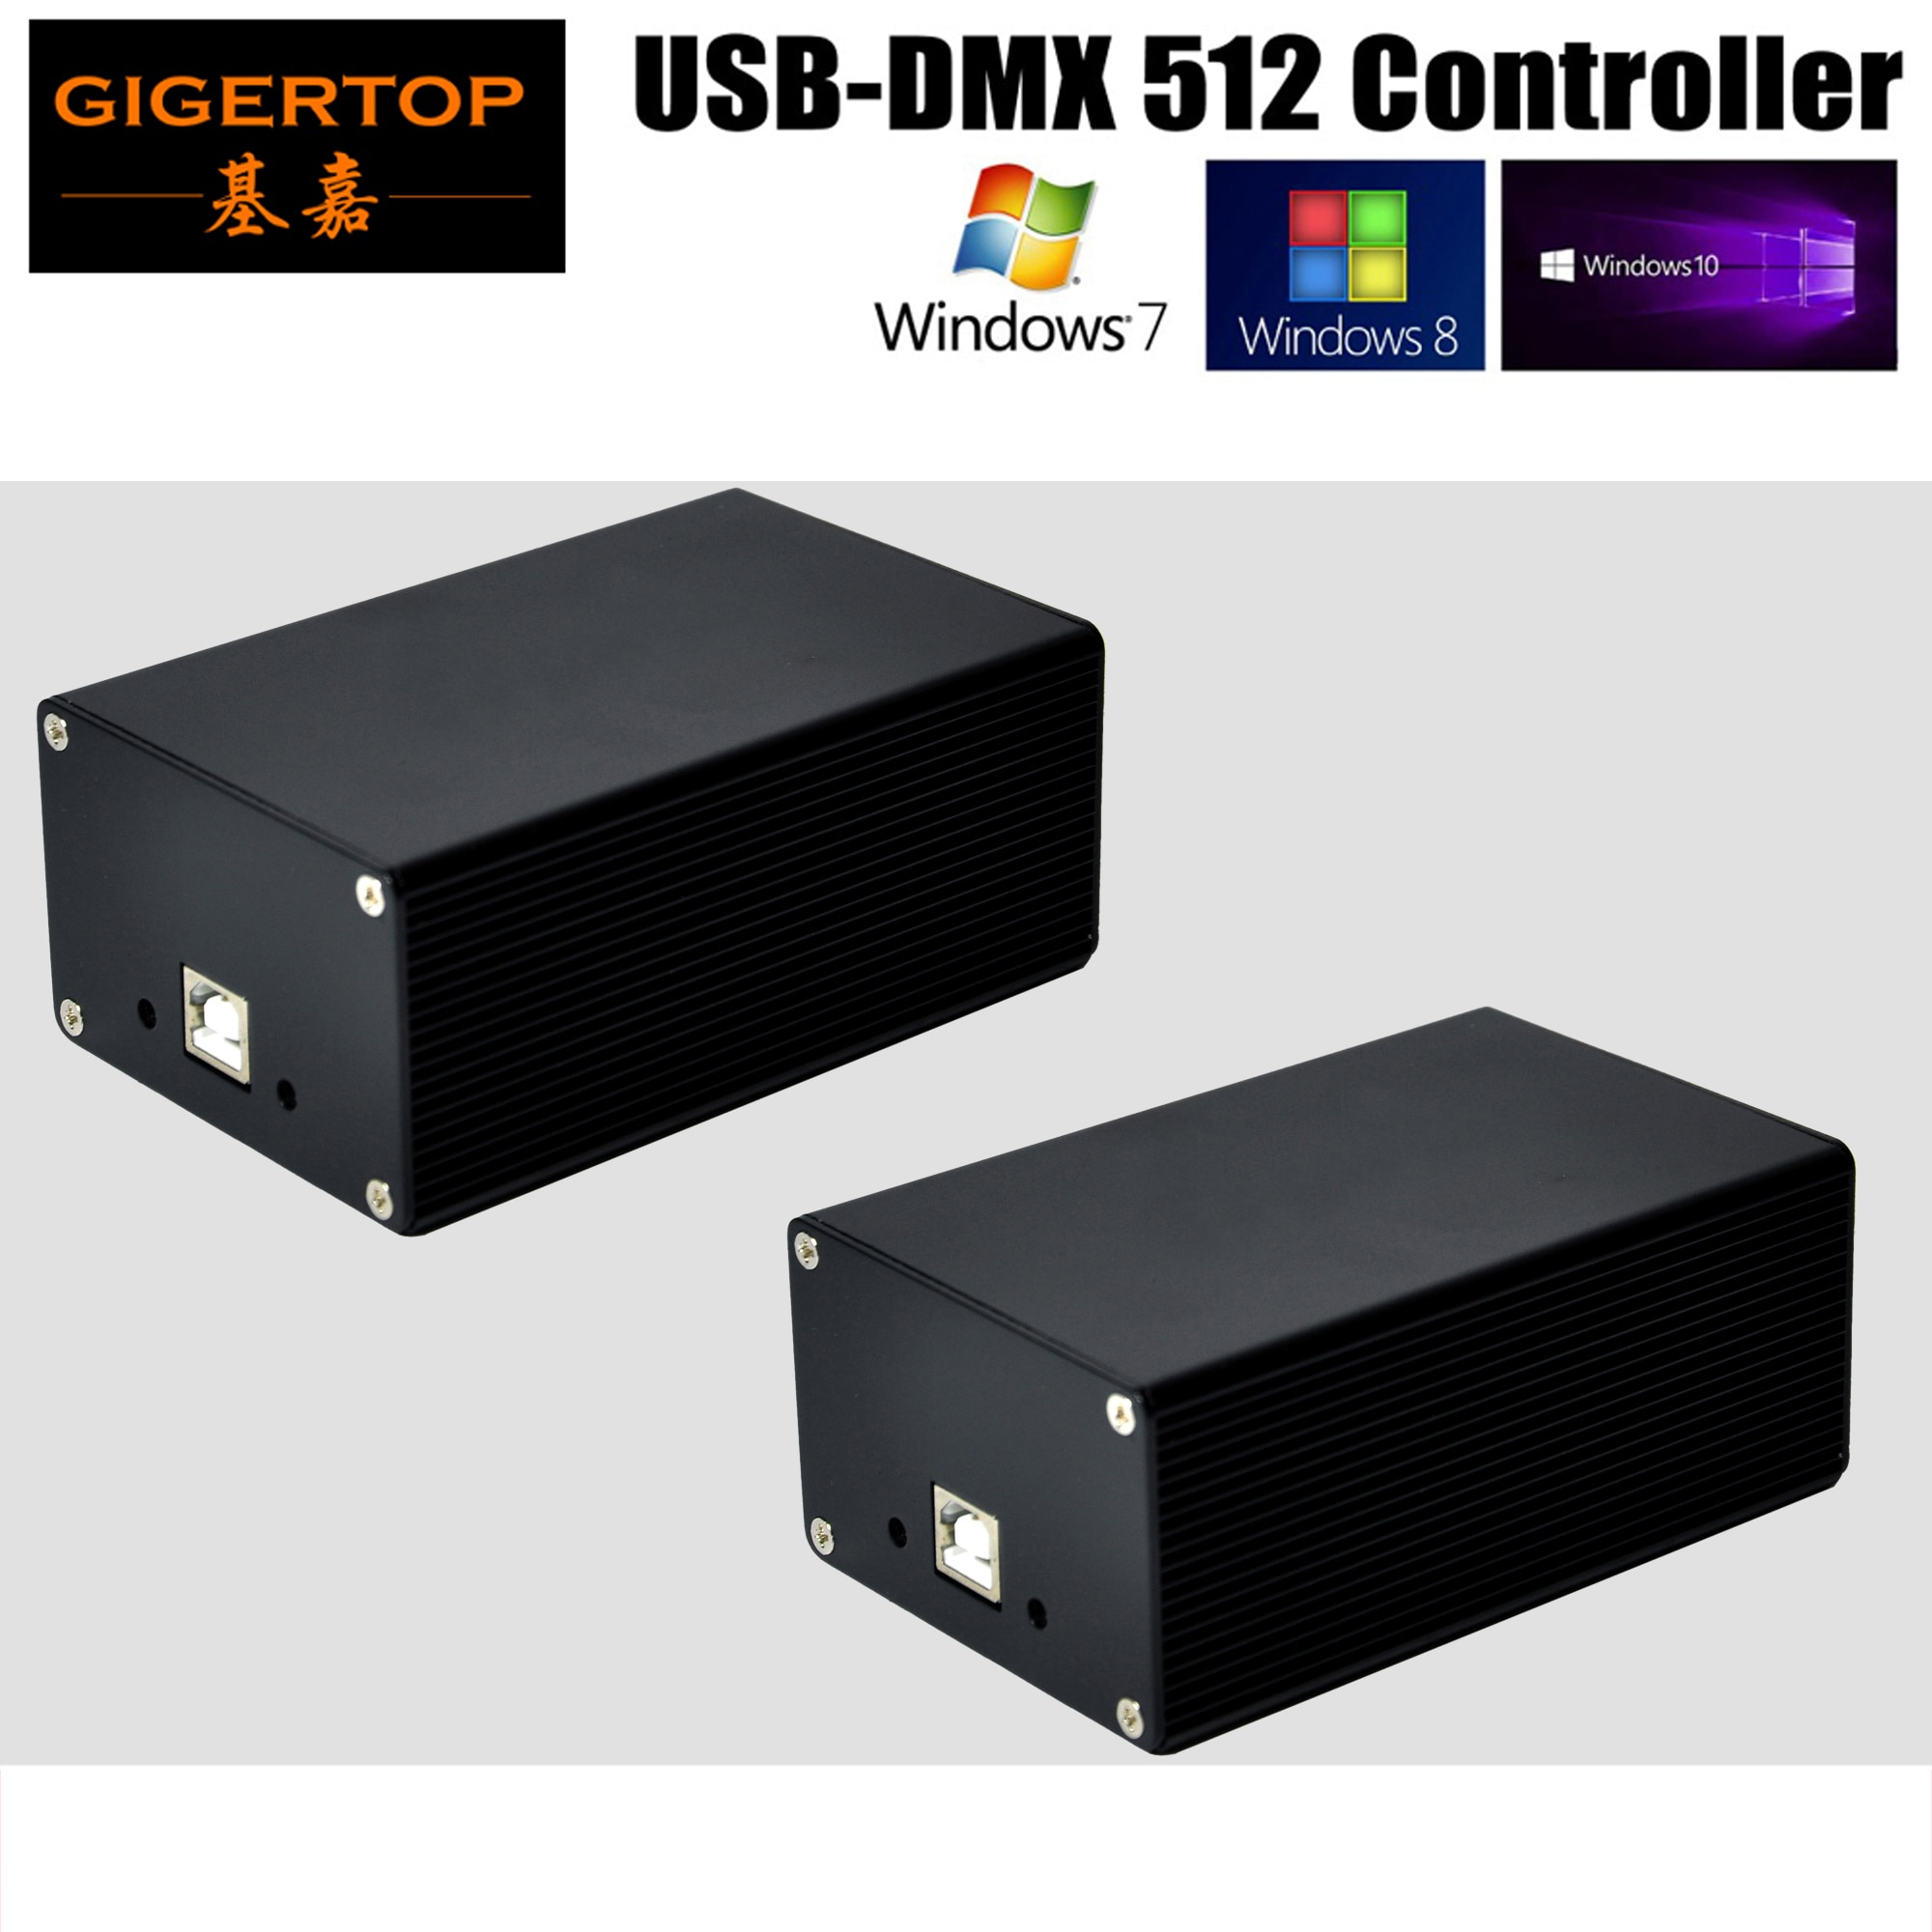 Envío gratis 2XLOT USB DMX 512 controlador de iluminación de escenario FreeStyler DMX Control HD512 caja fuente de alimentación USB Mini DMX512 Consolador